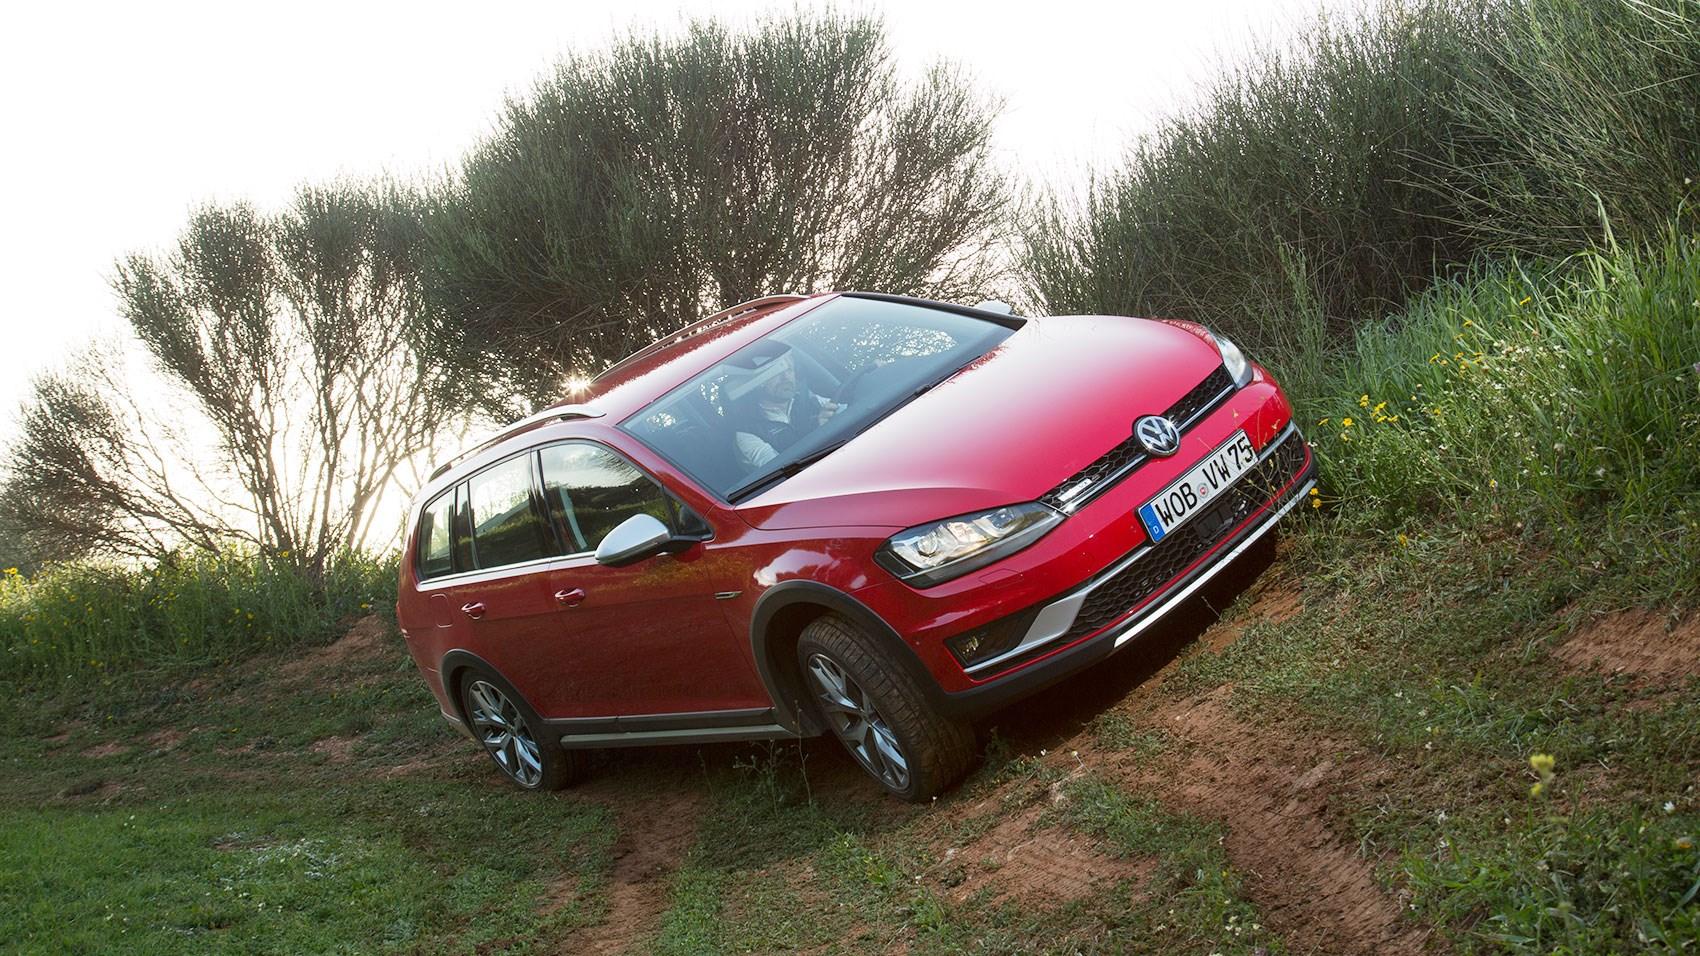 VW Golf Alltrack 2.0 TDI DSG (2015) review | CAR Magazine